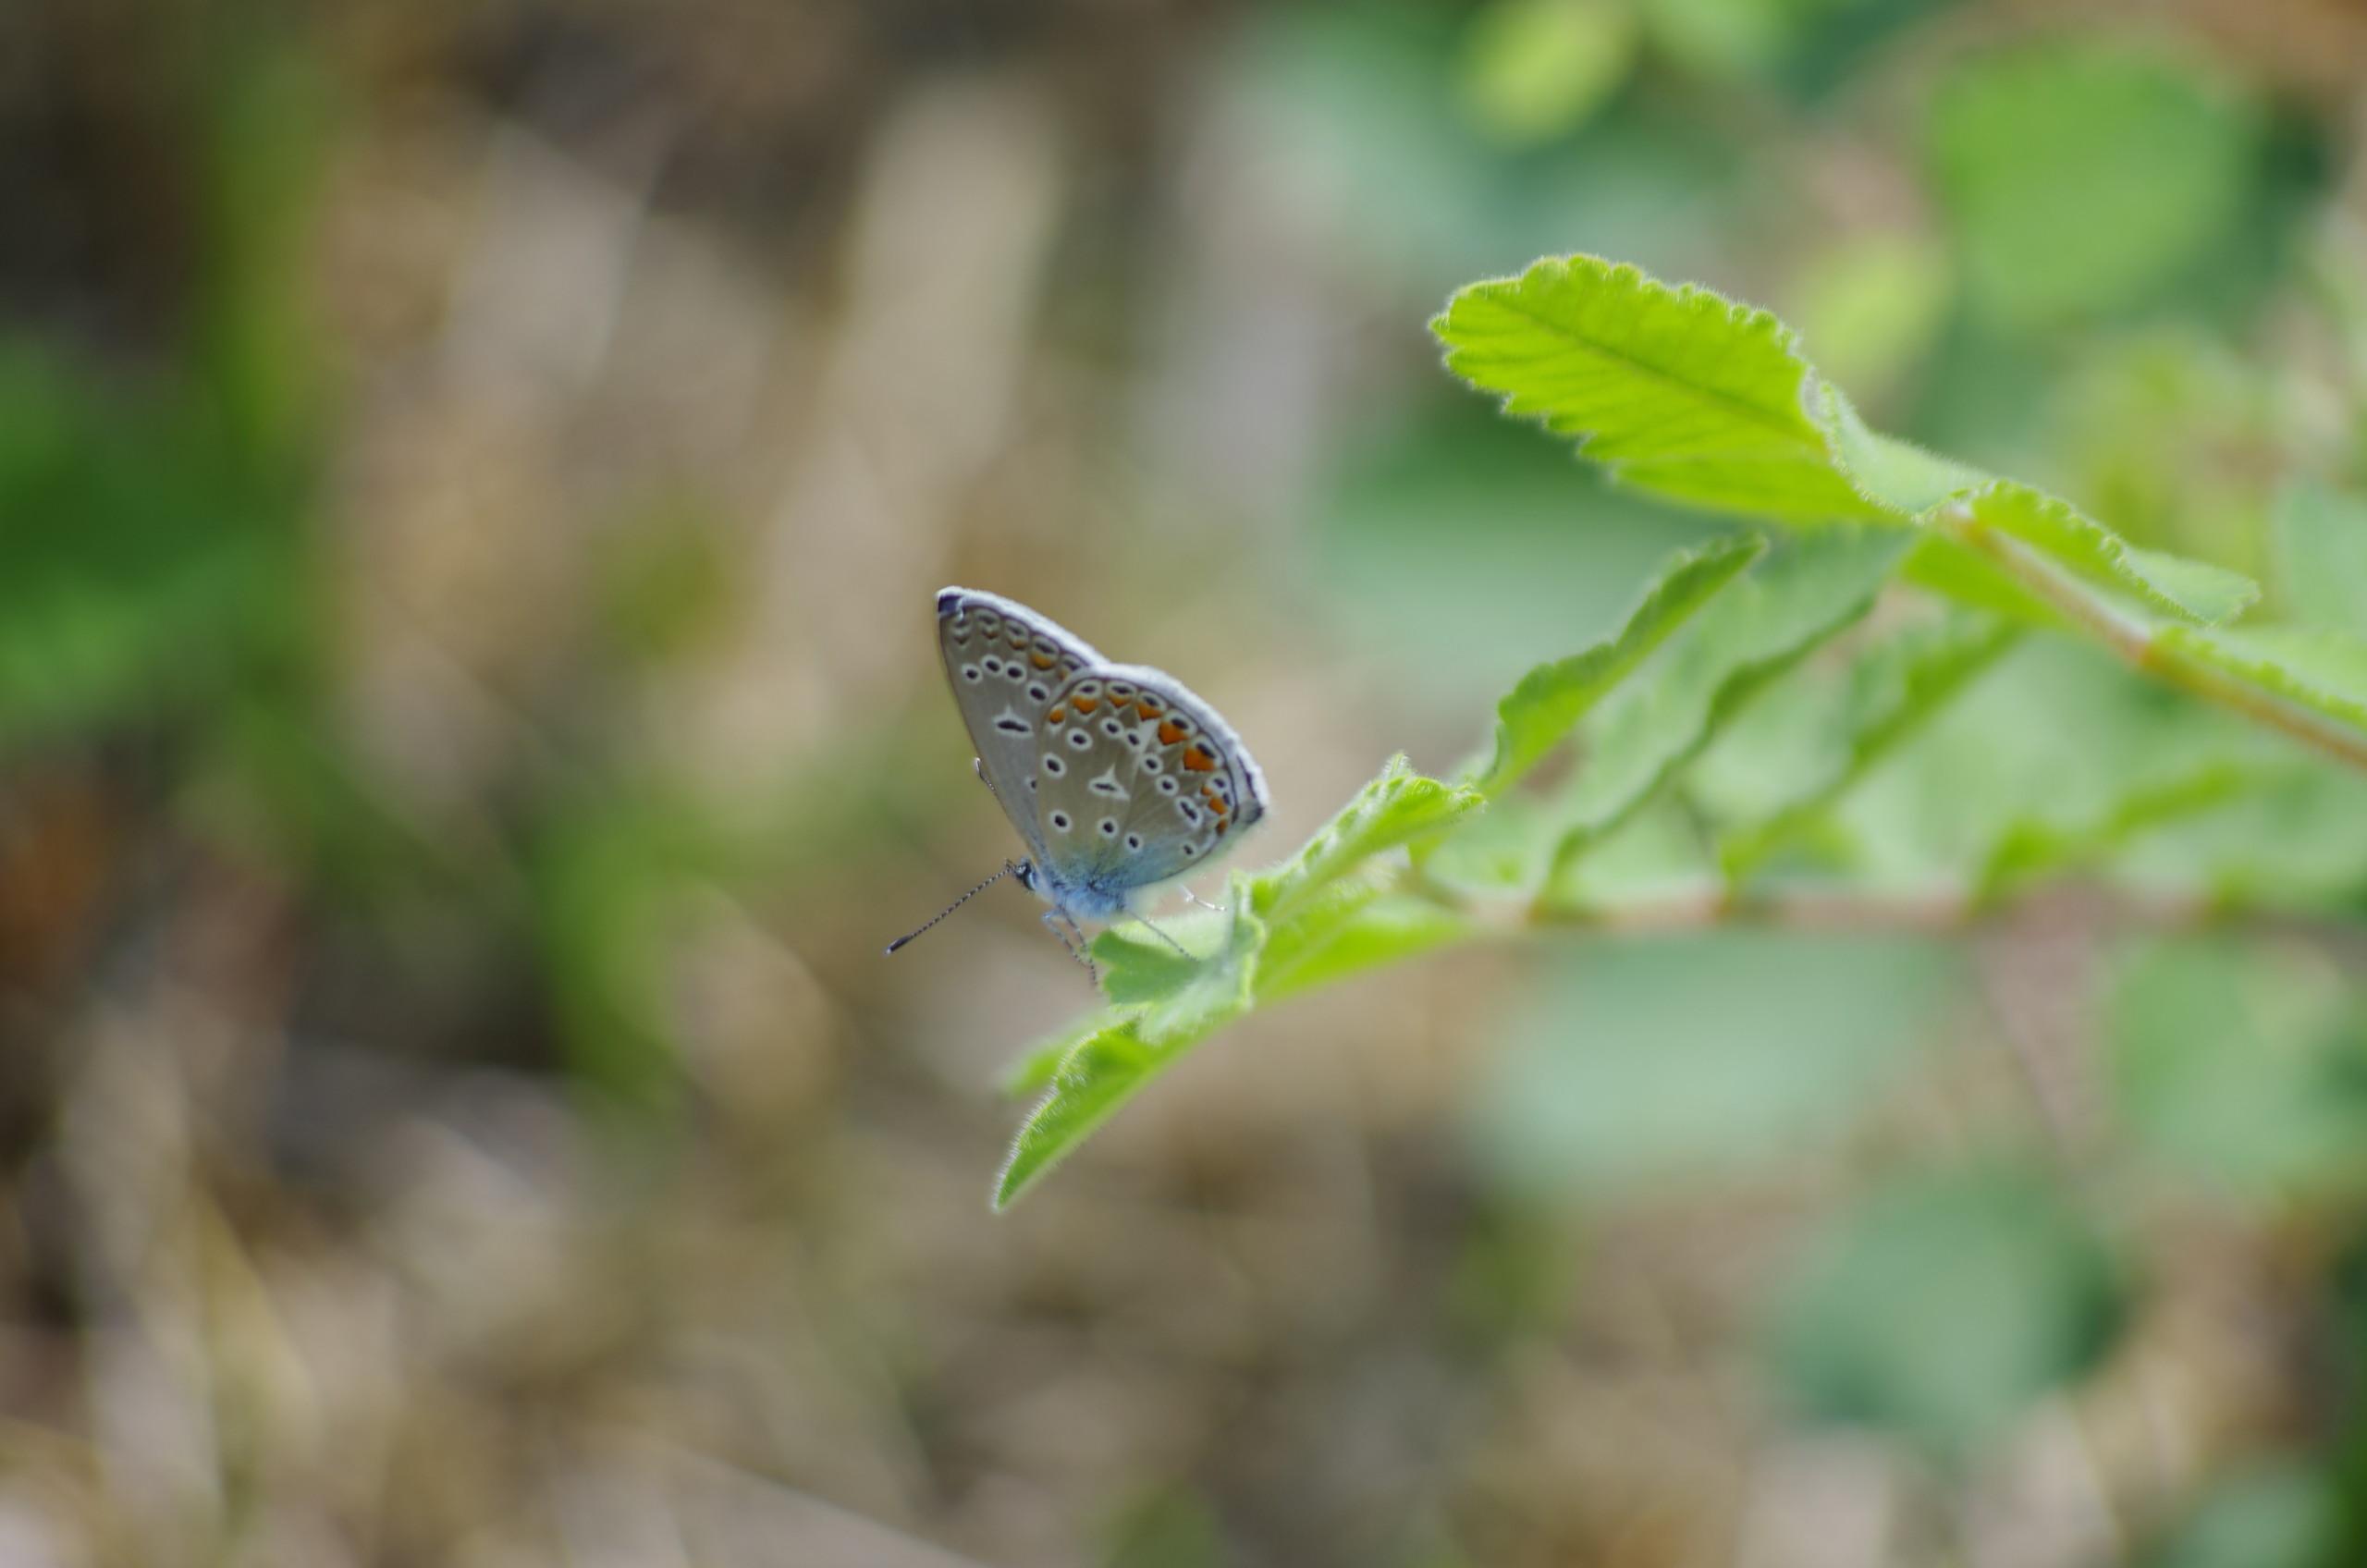 28 8 2016 K5 2S Pentax Dal 55 300 Japon Bahçesi Kelebek (6)